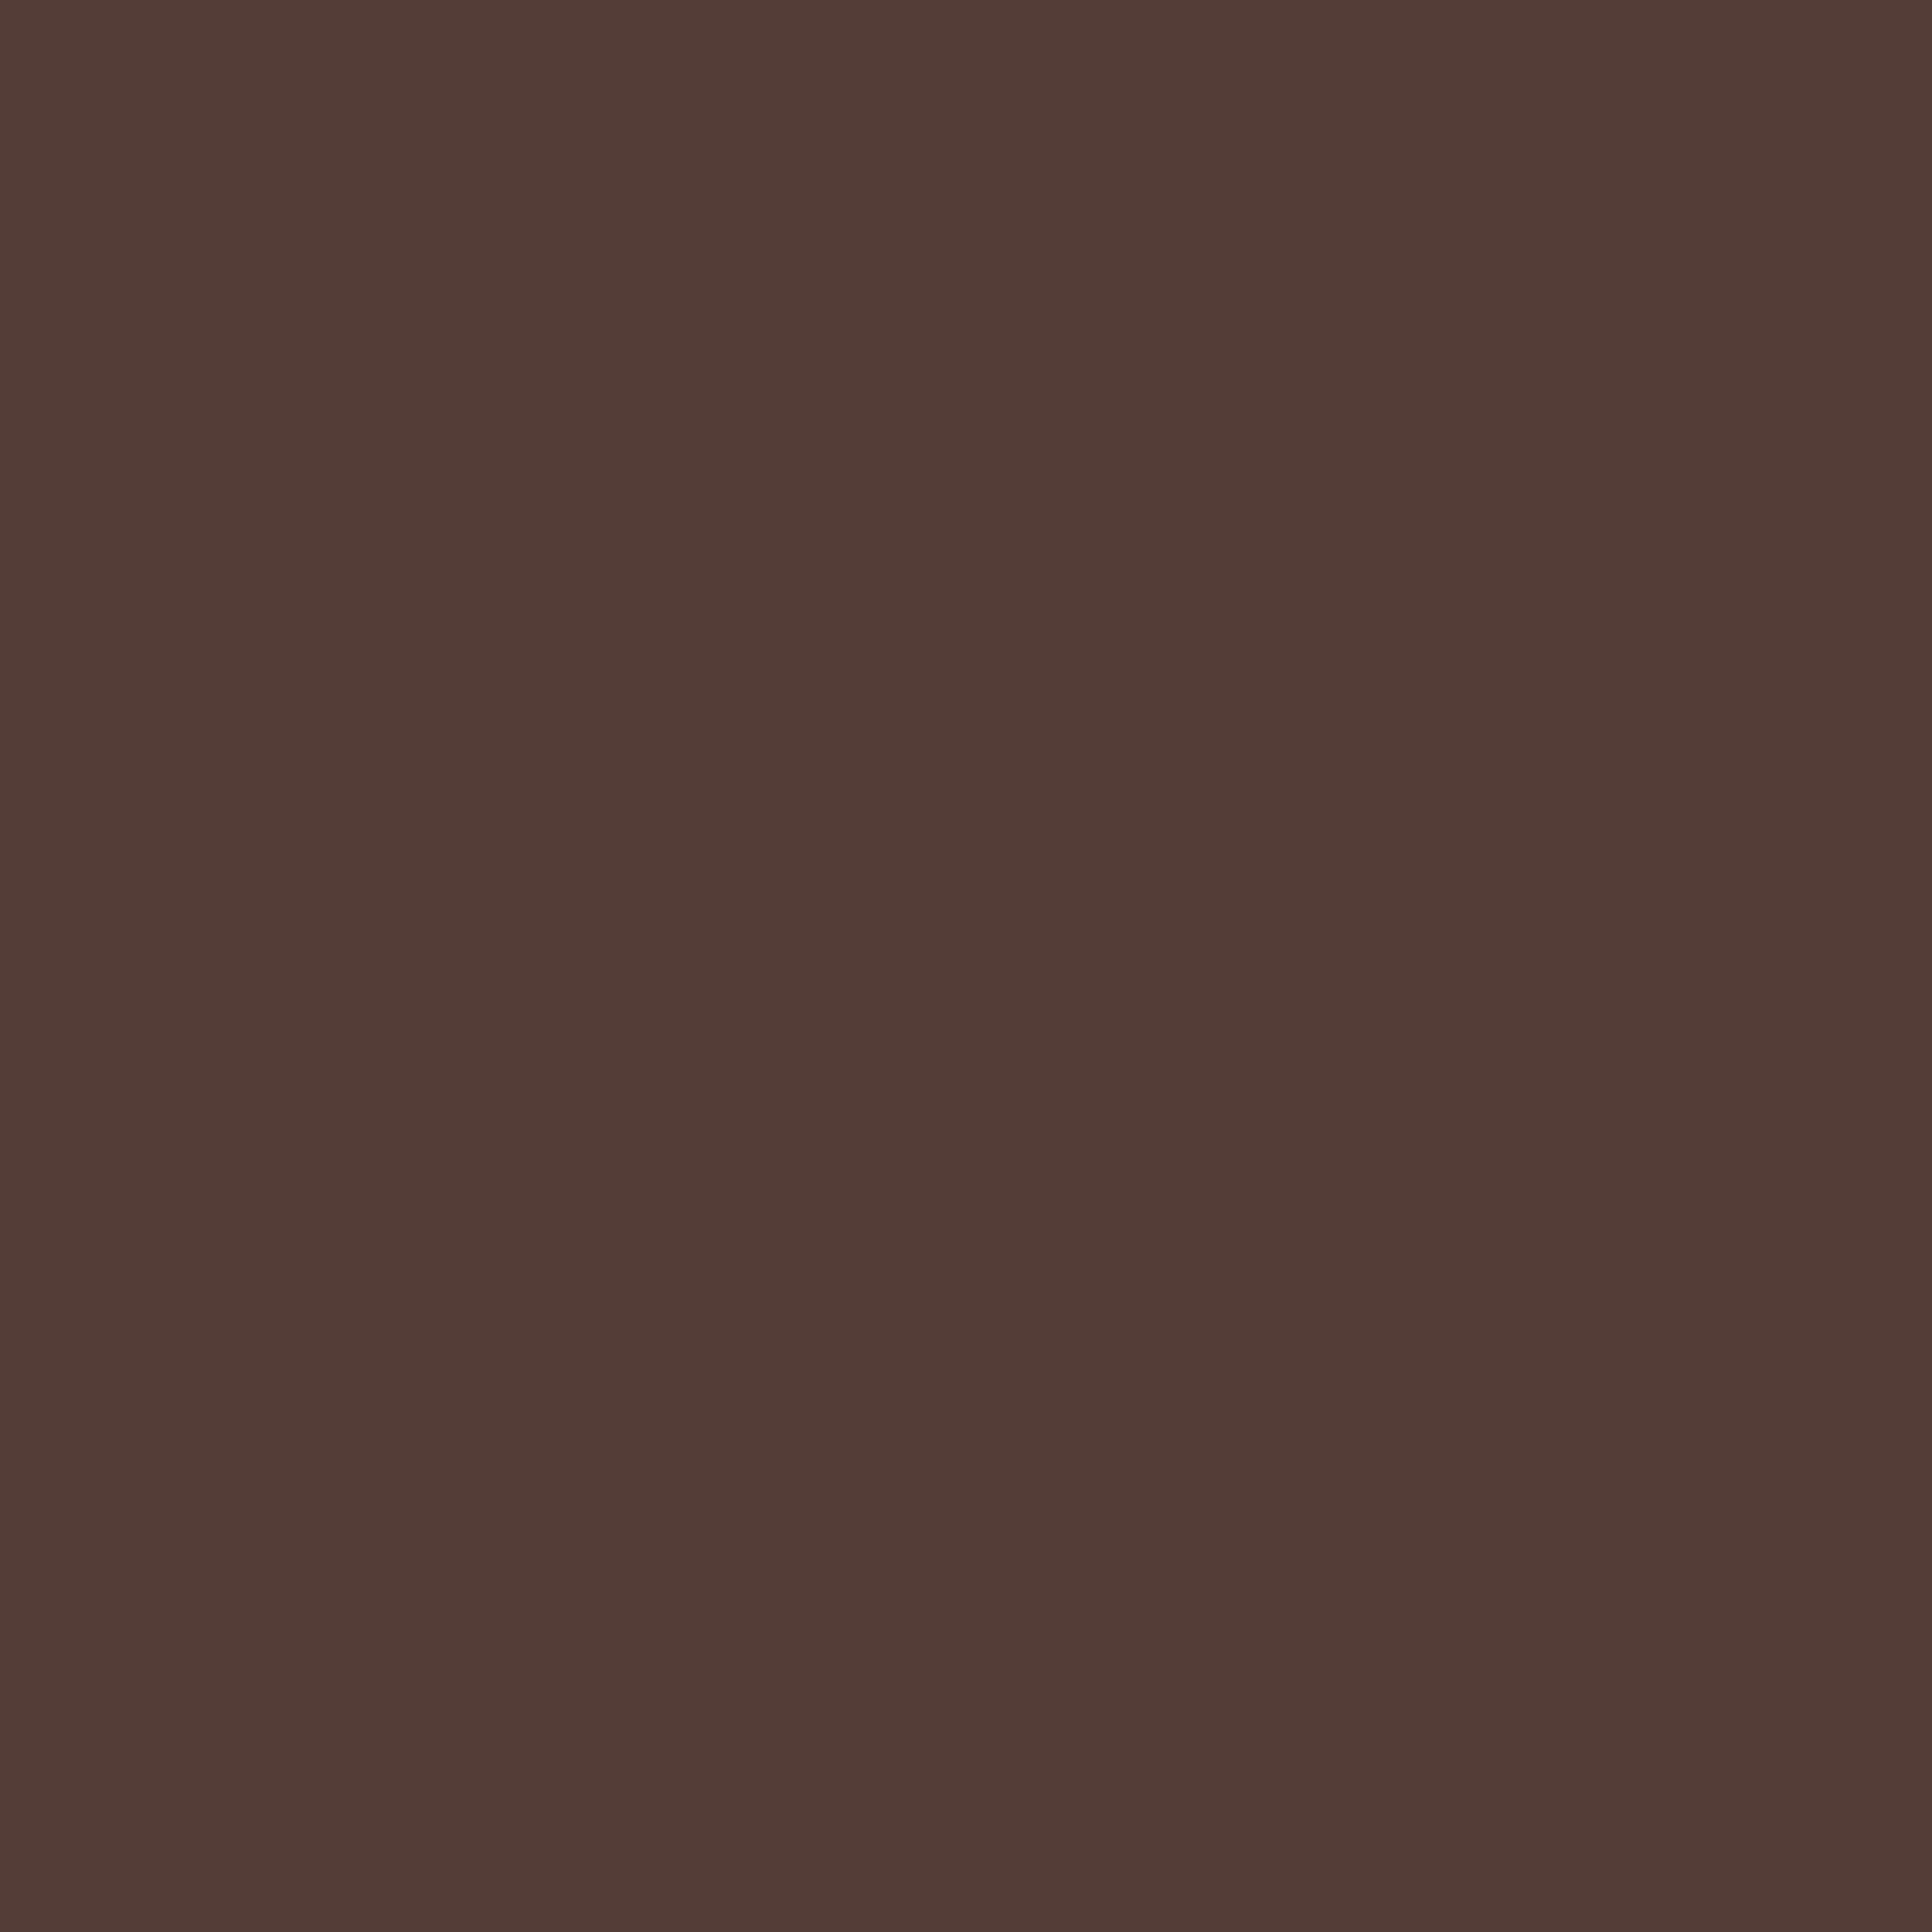 2732x2732 Dark Liver Horses Solid Color Background